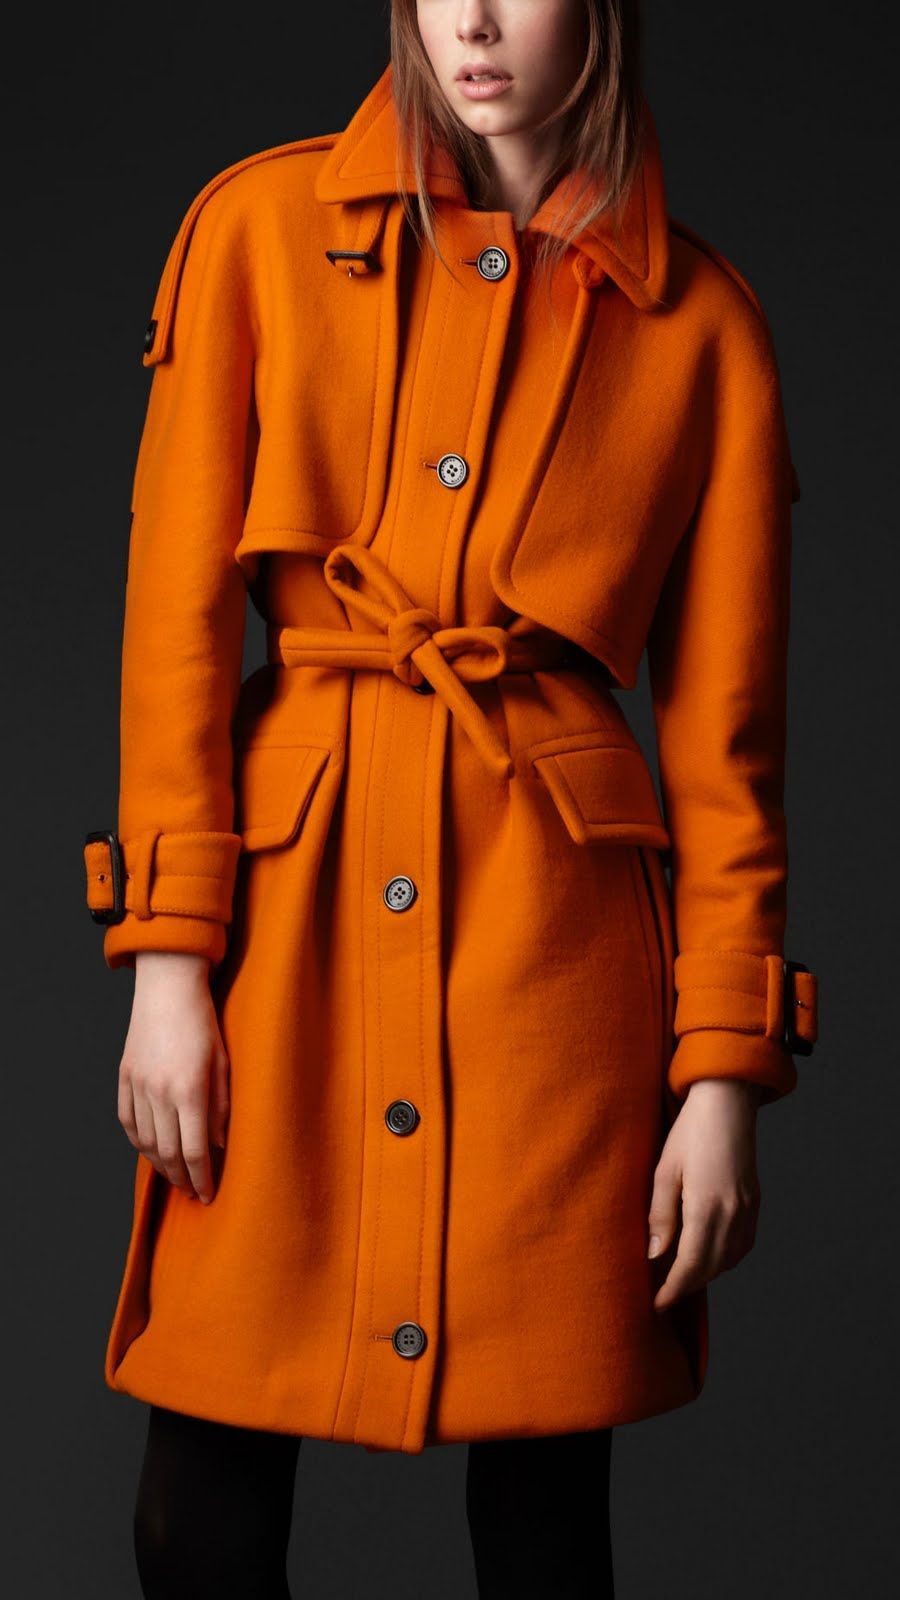 orange wool coat | Virgin Wool Trench Coat: Burberry | Autumn ...